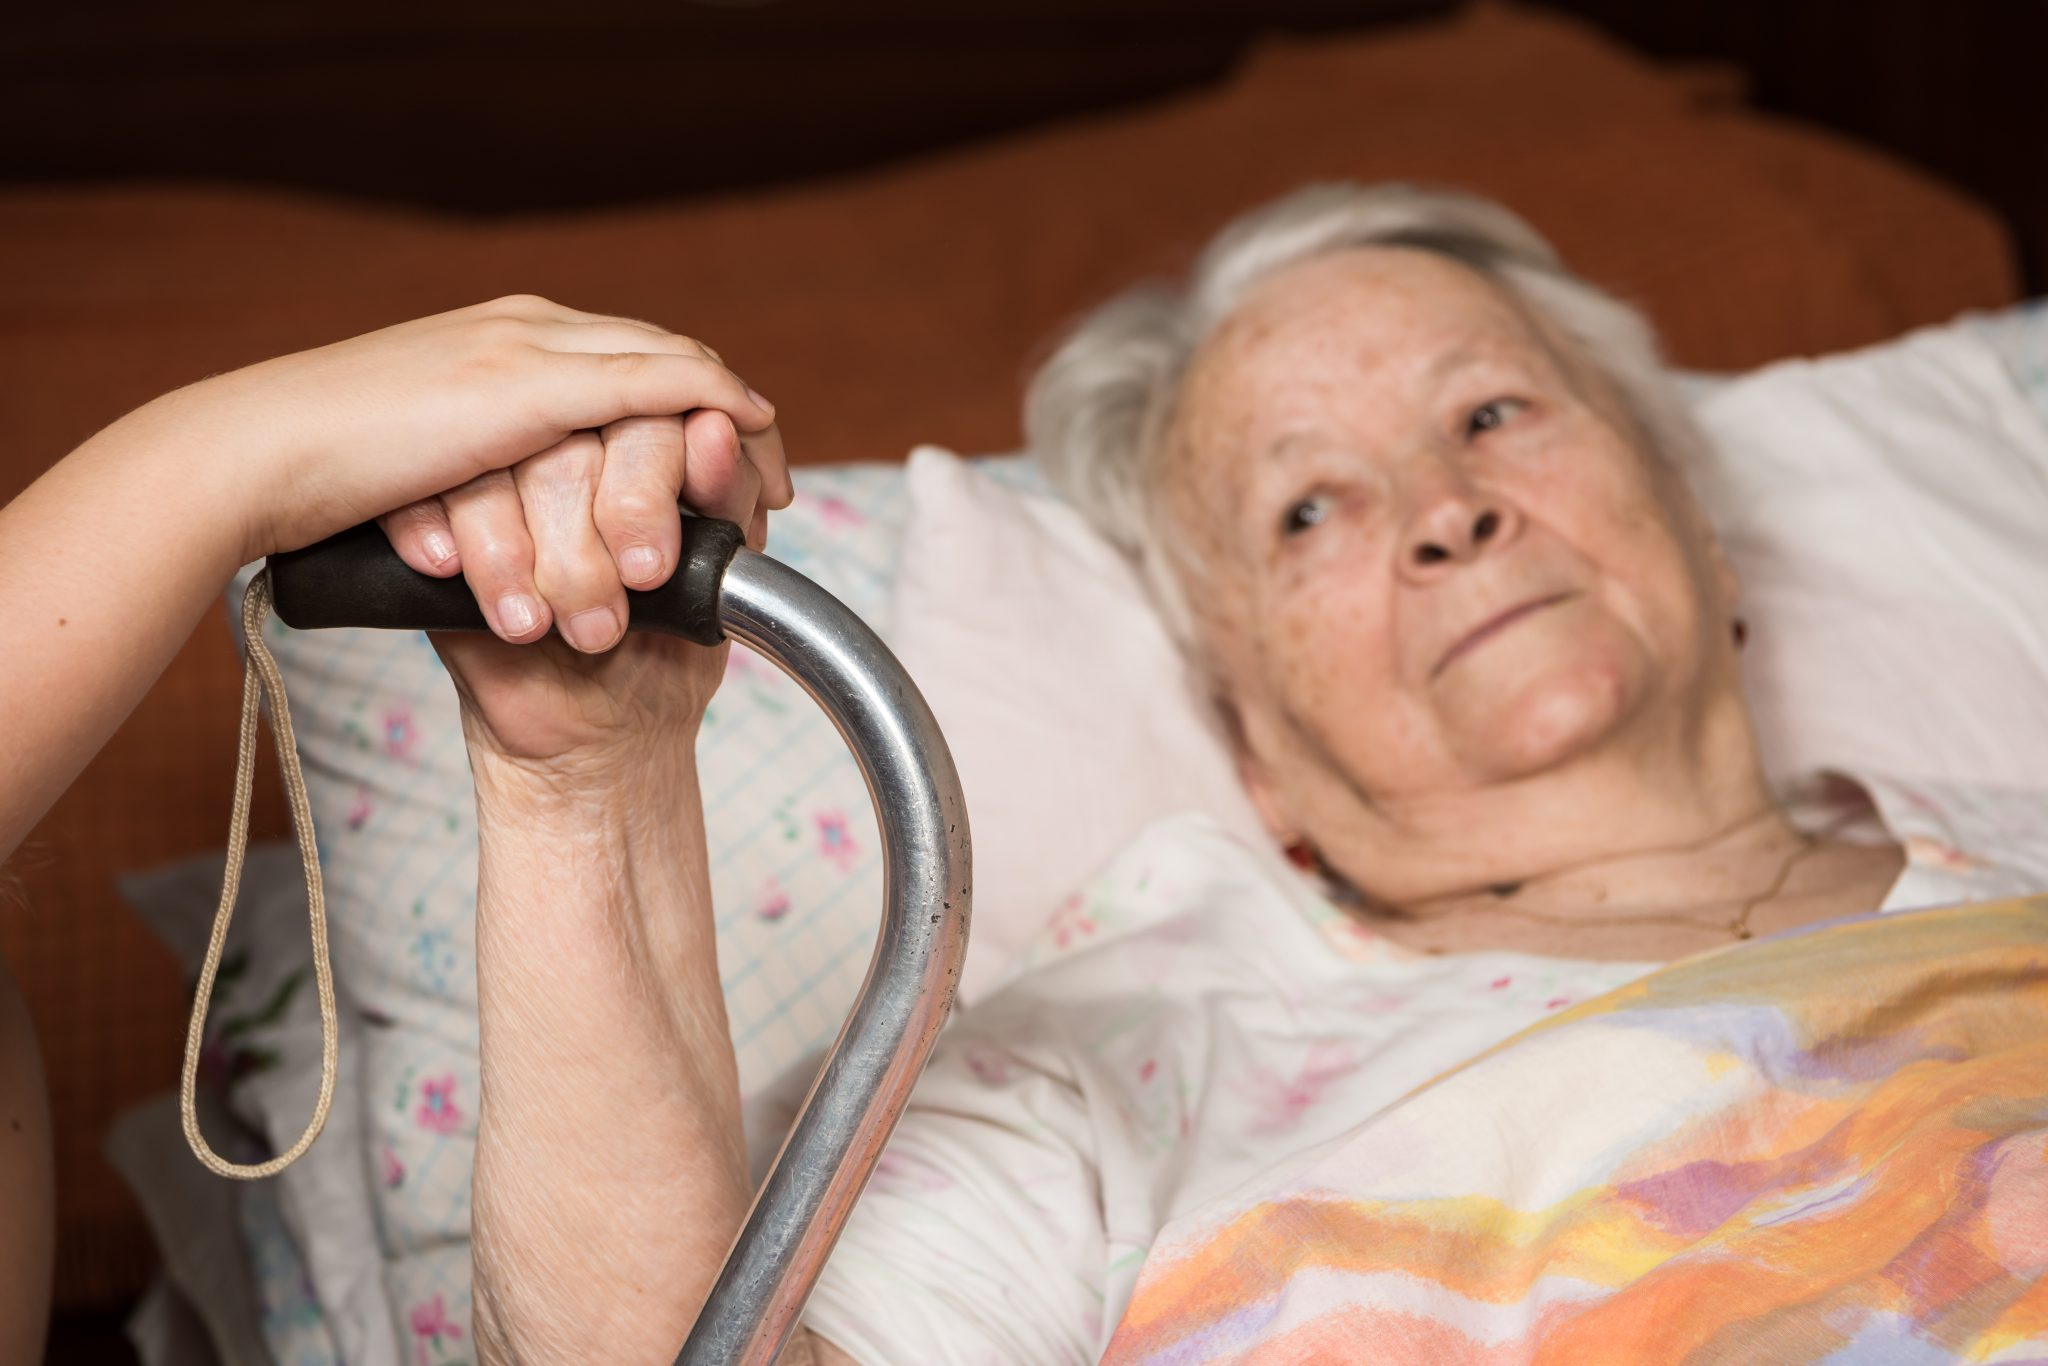 elderly womean in bed with walker